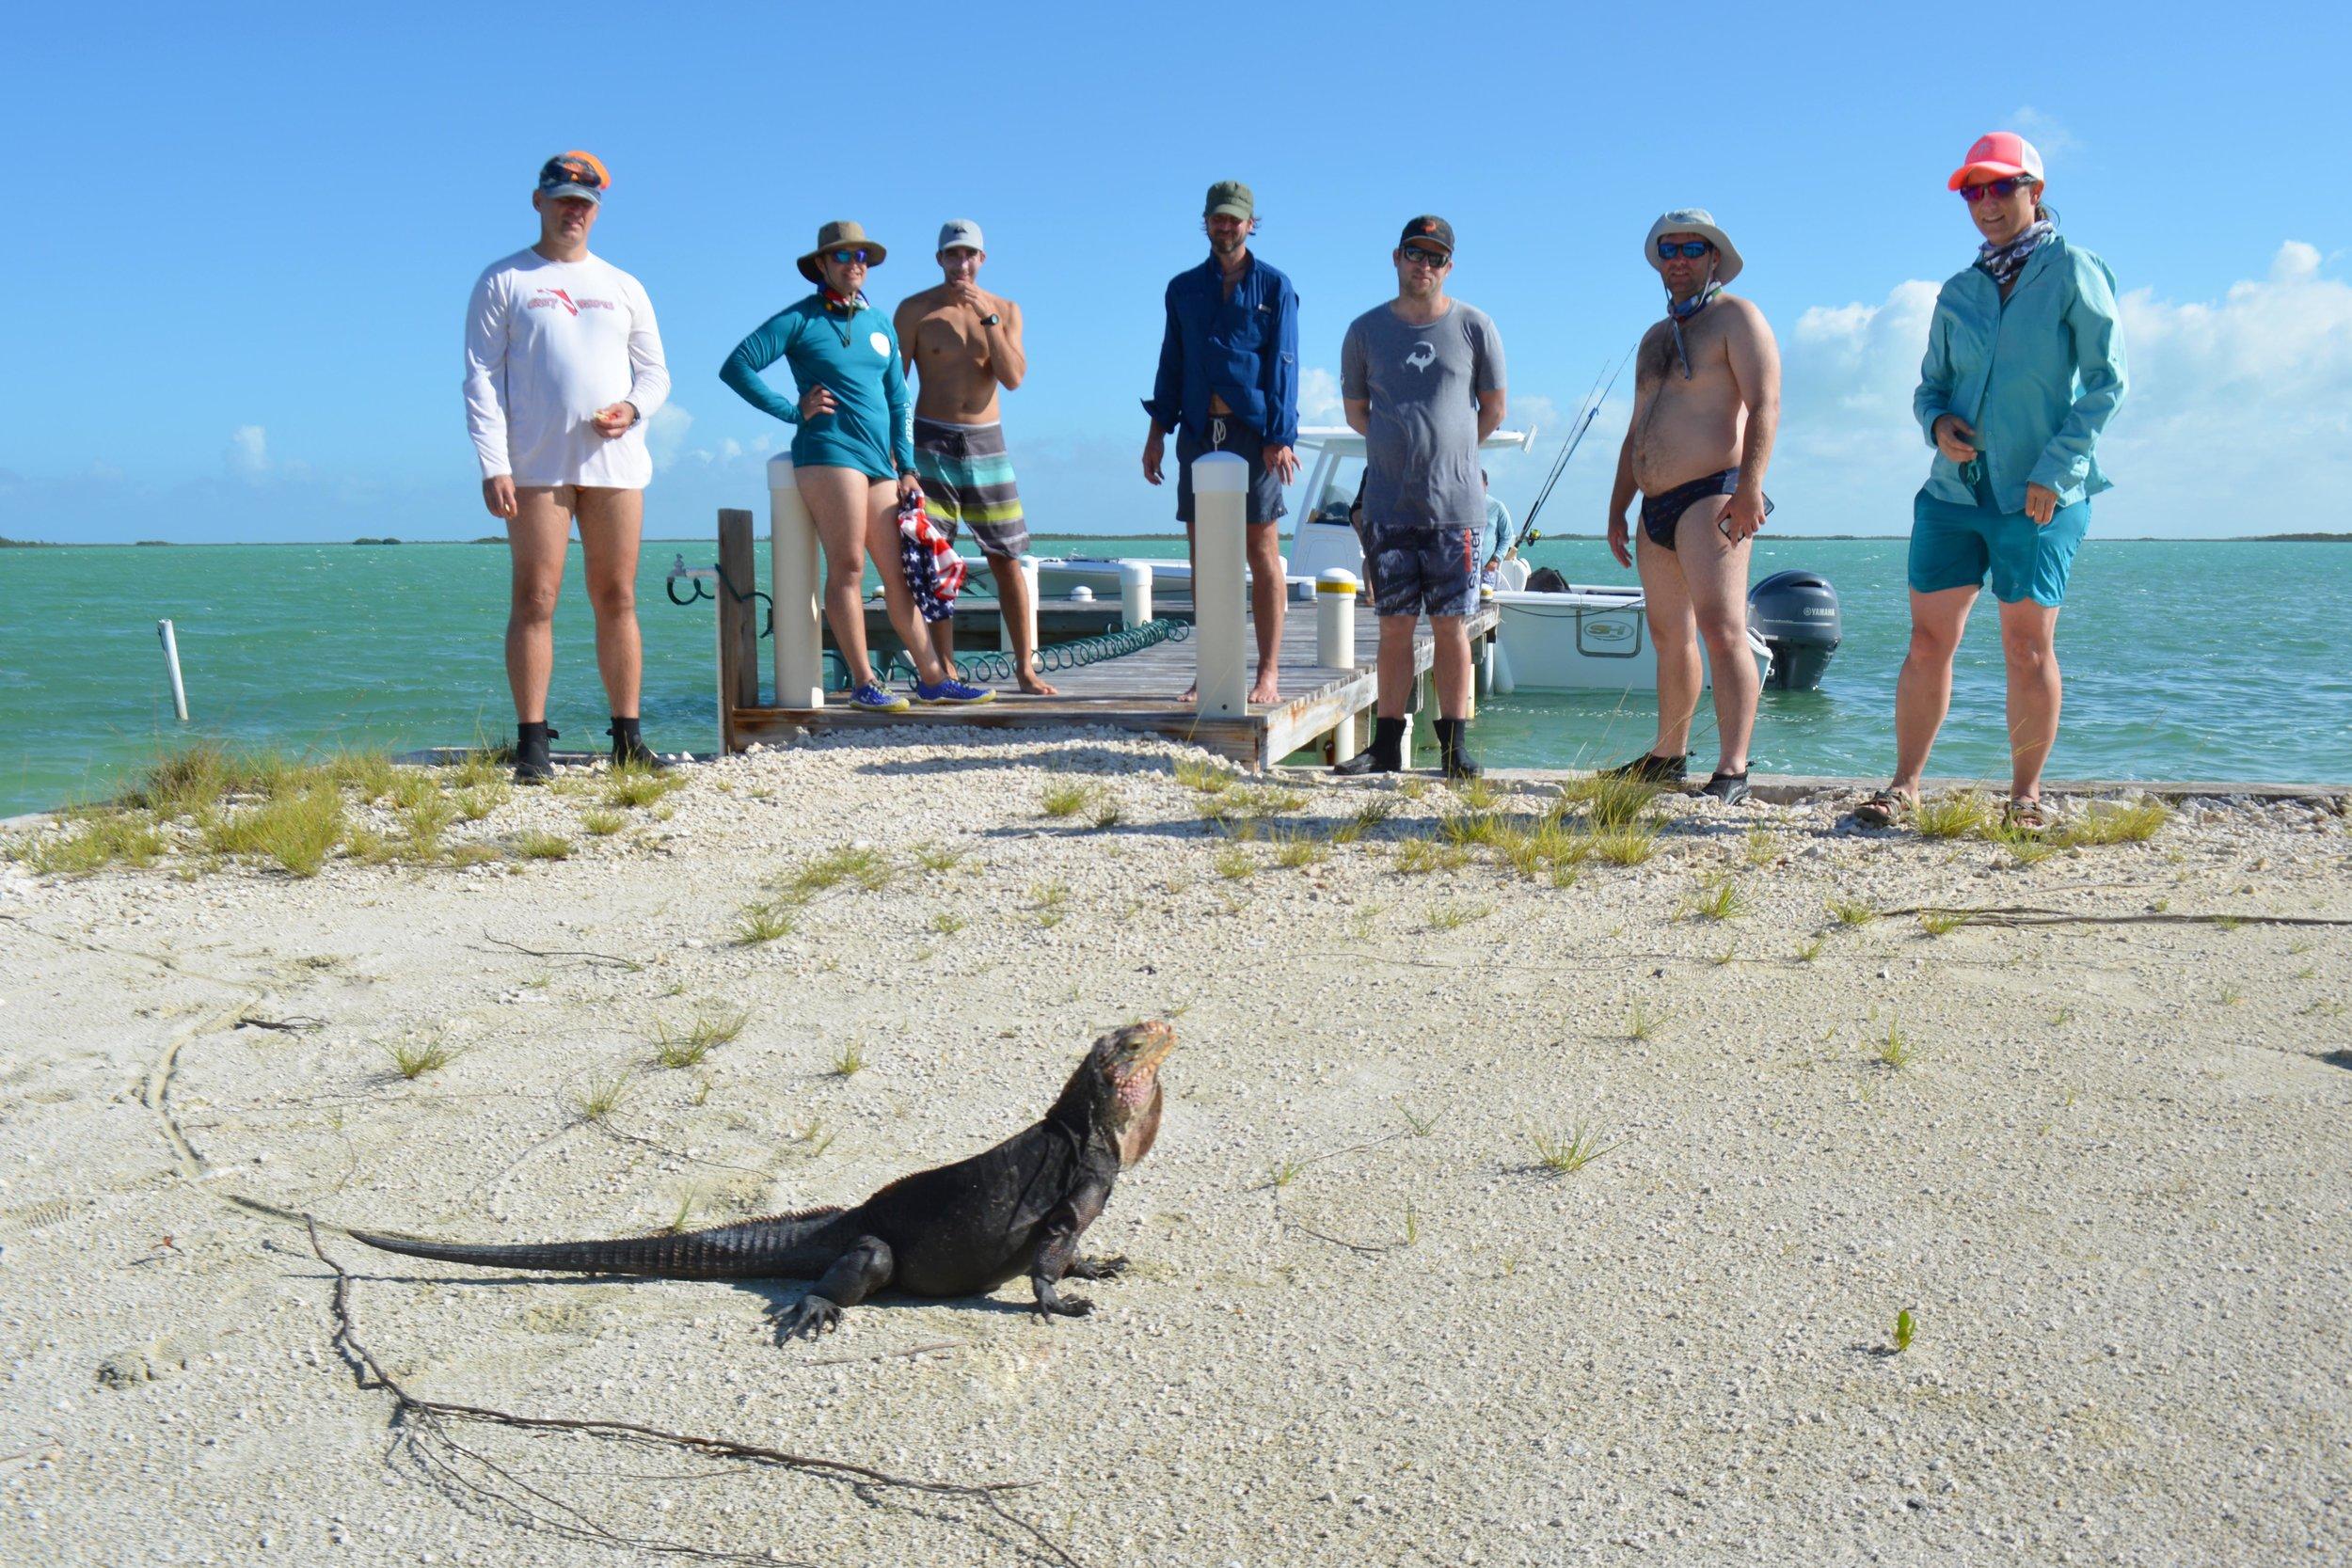 A friendly iguana strikes a pose